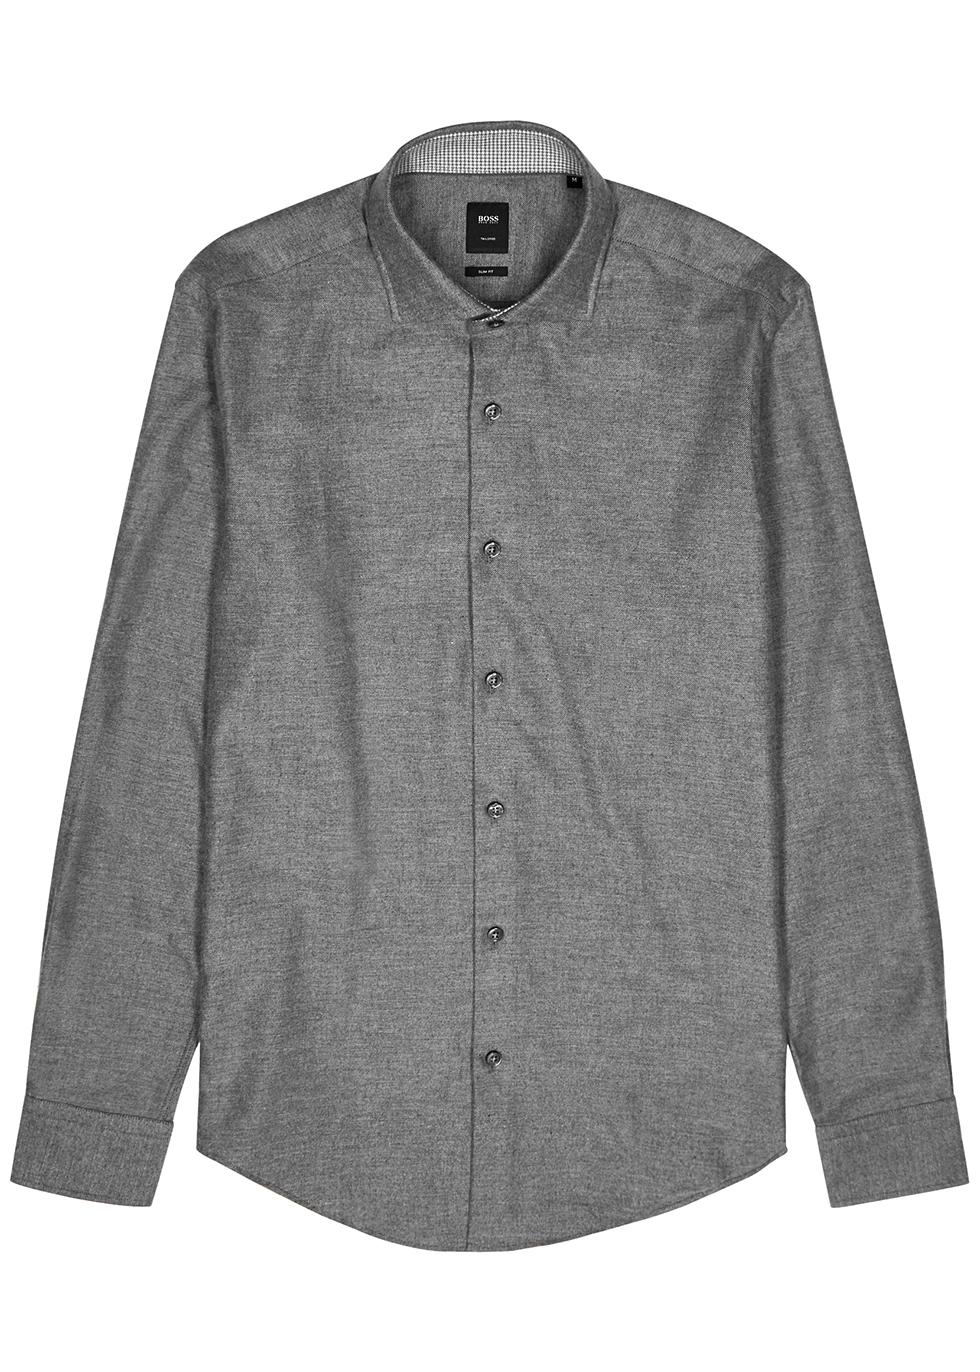 Randolph grey cotton-blend shirt